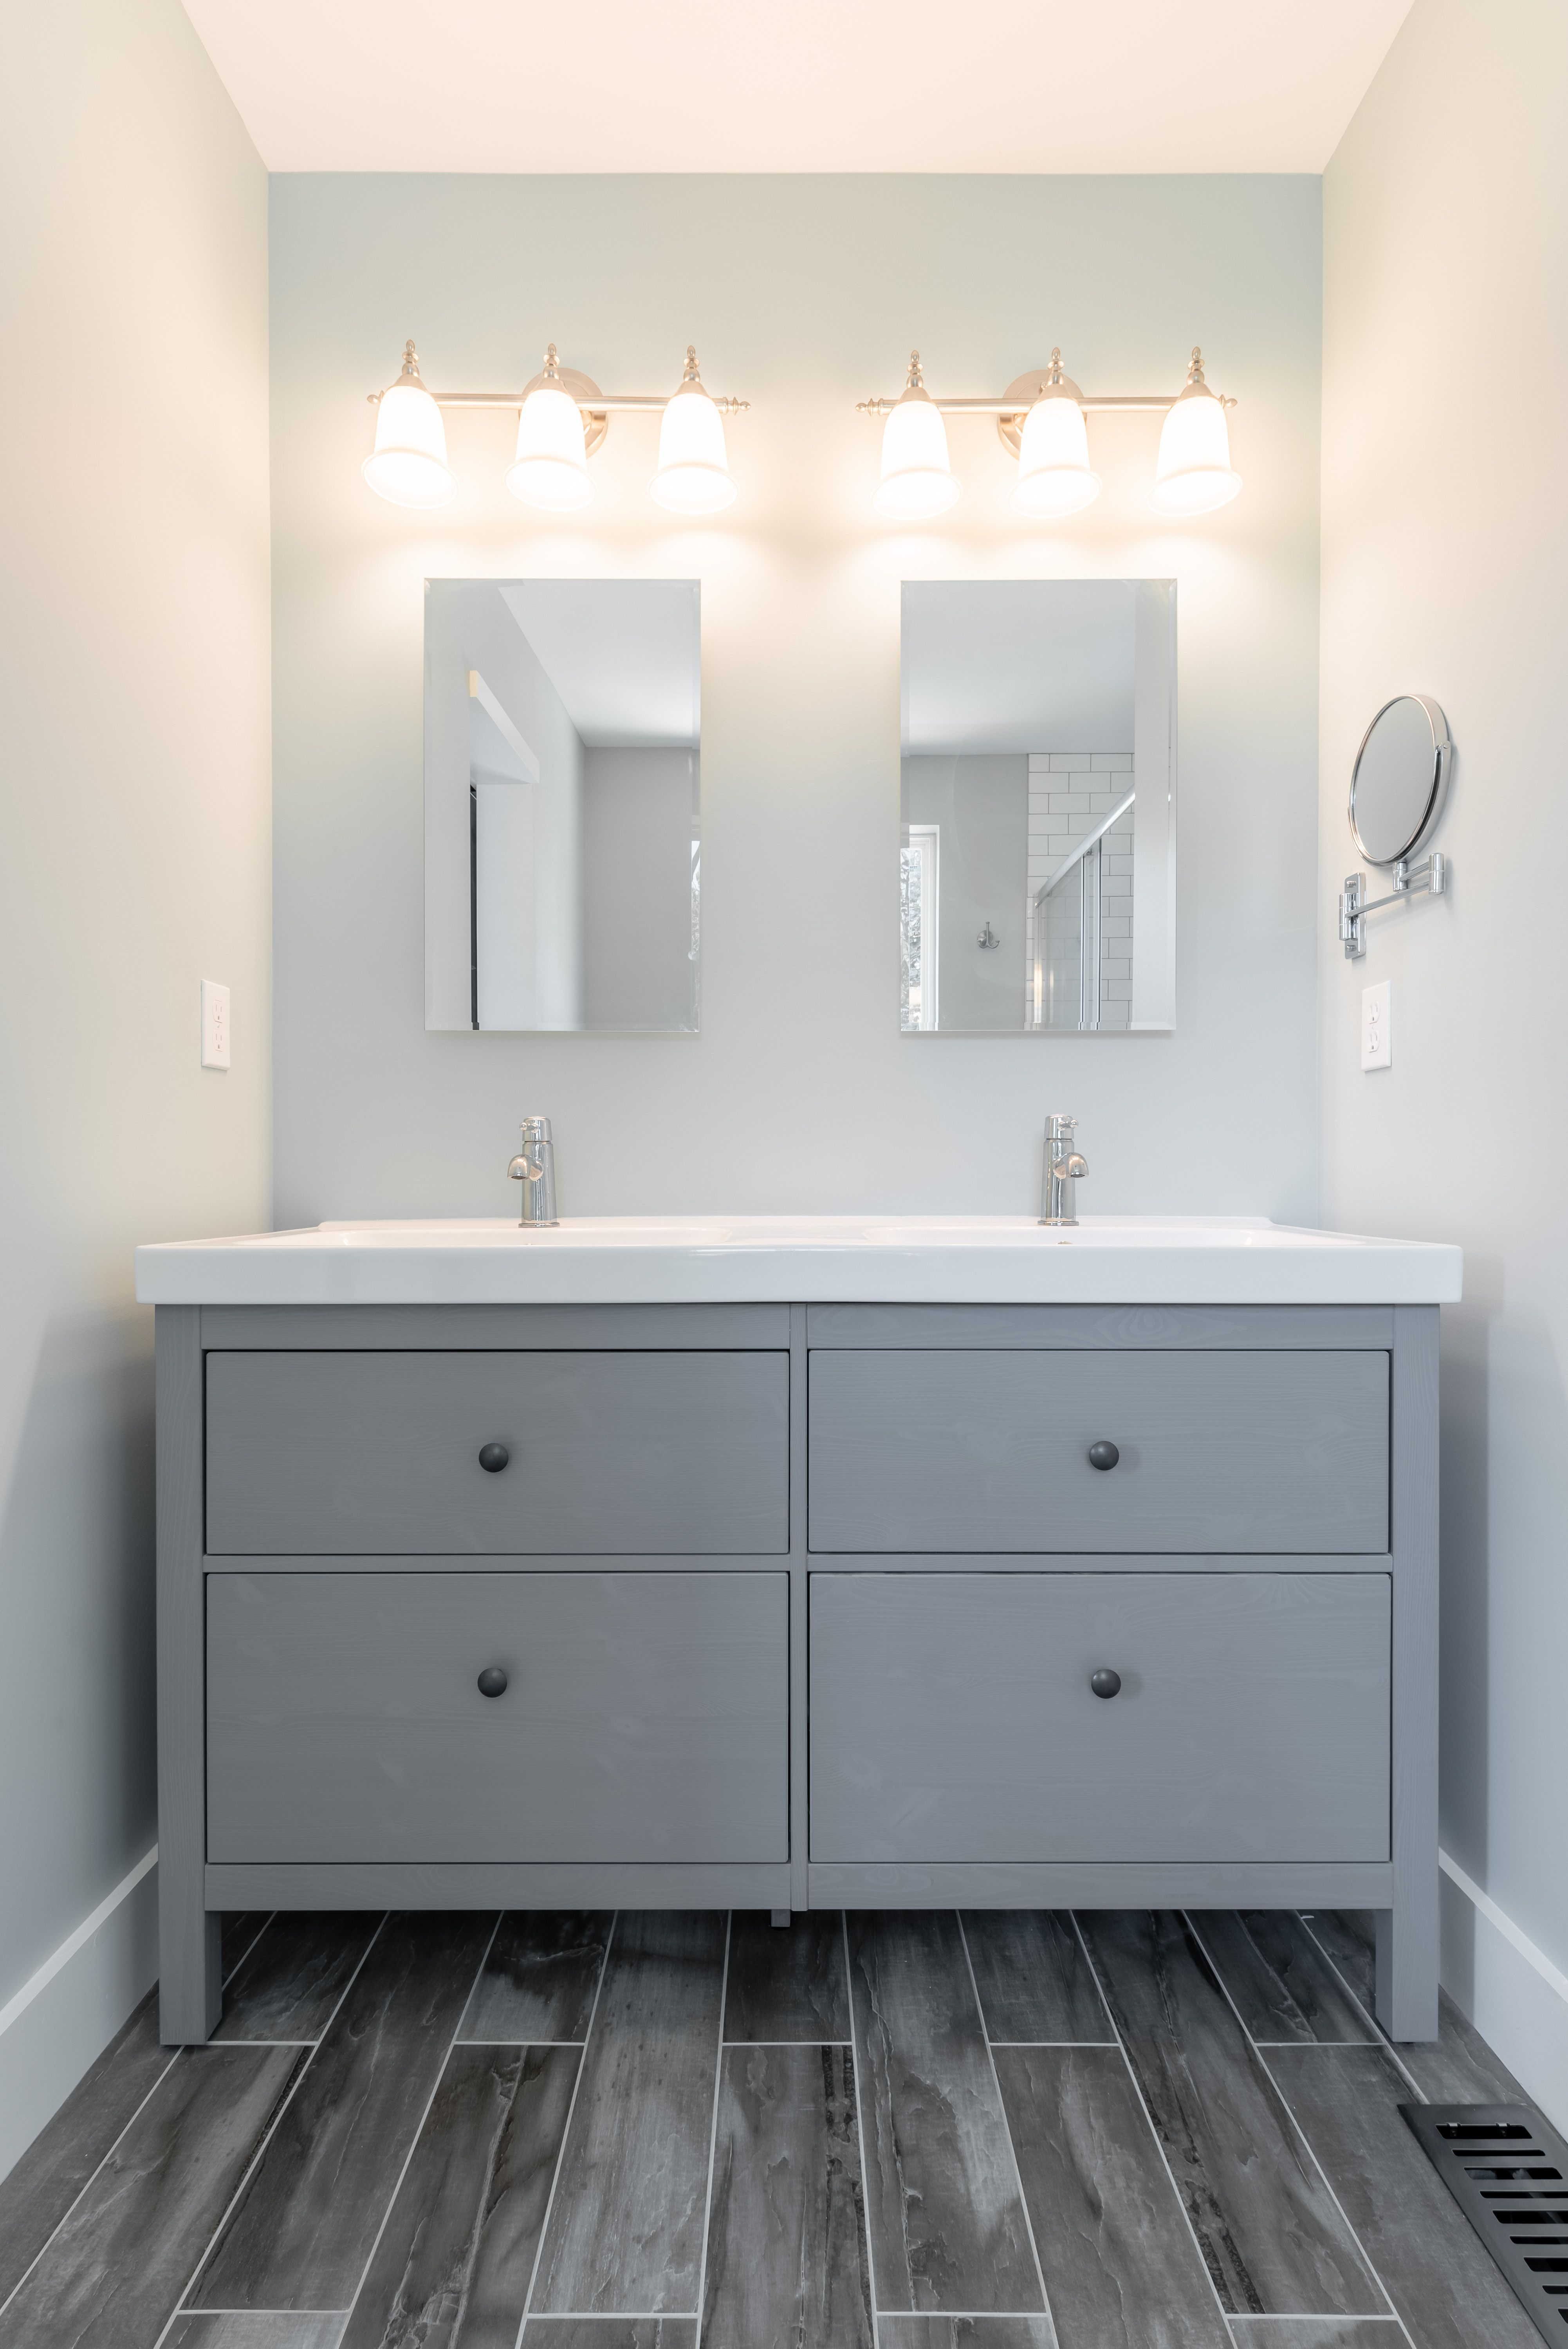 IKEA gray Hemnes Odensvik Vanity with Granskar faucet